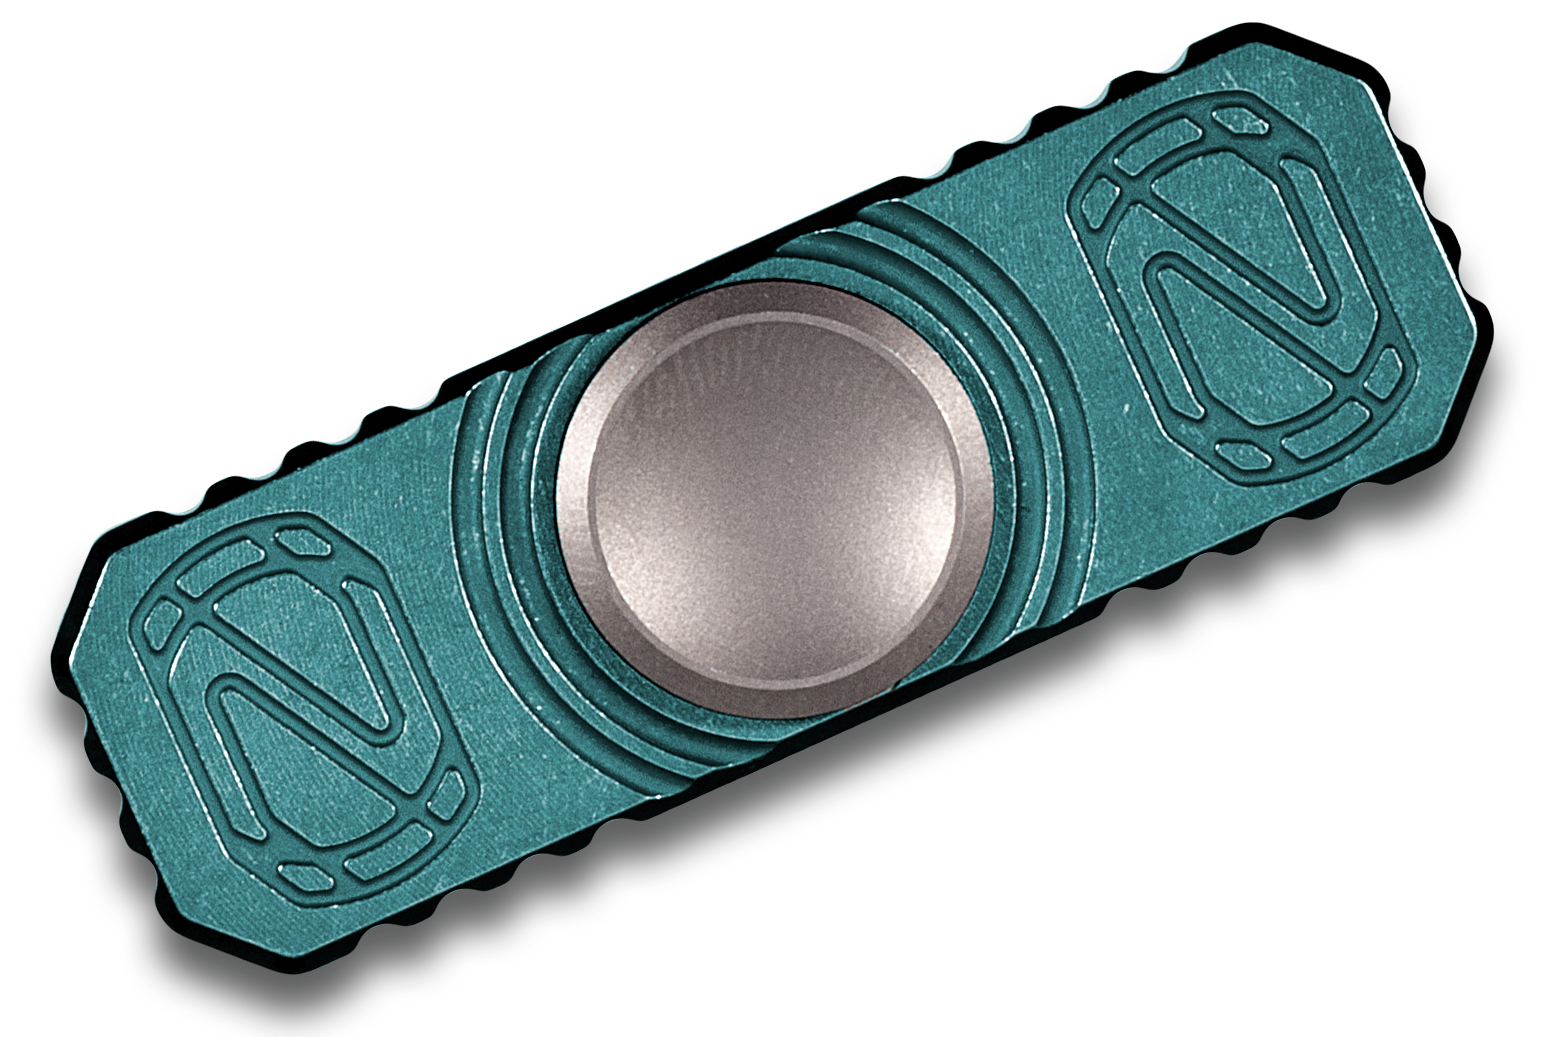 Stedemon Blue Key Chain Hand Fidget Spinner Z05BLU